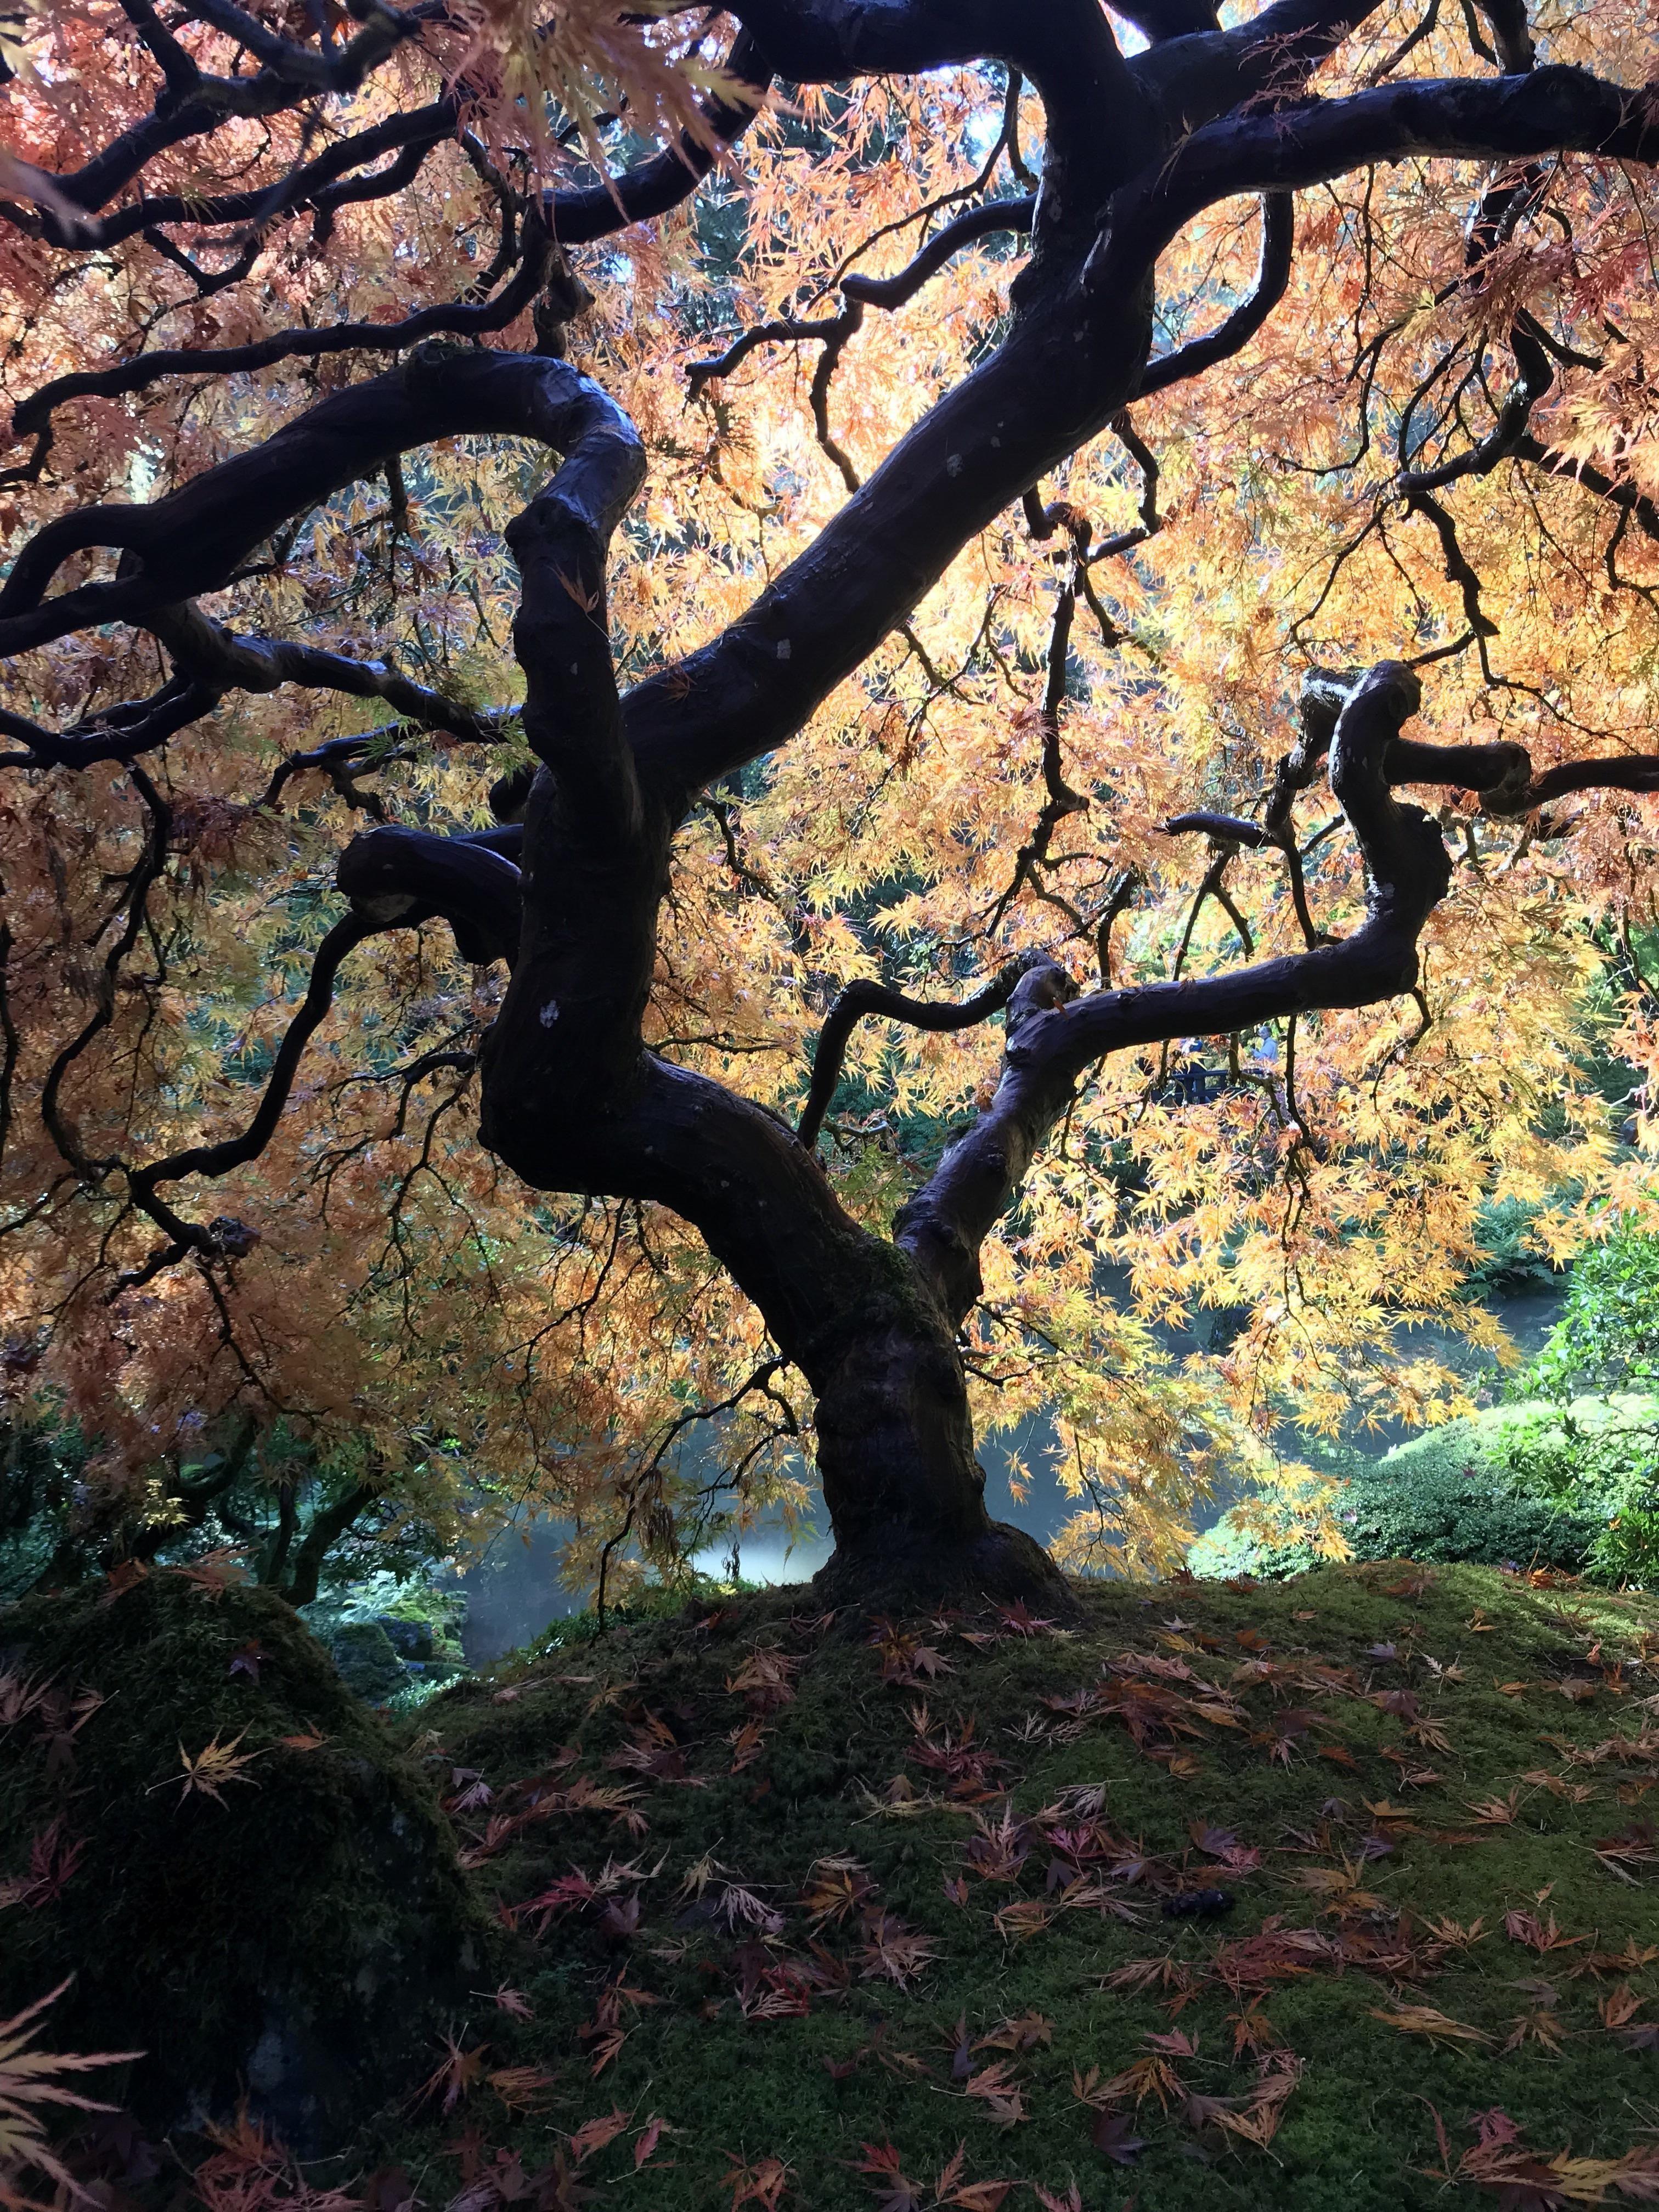 Japanese Maple at the Japanese Gardens [1334x750] [OC]